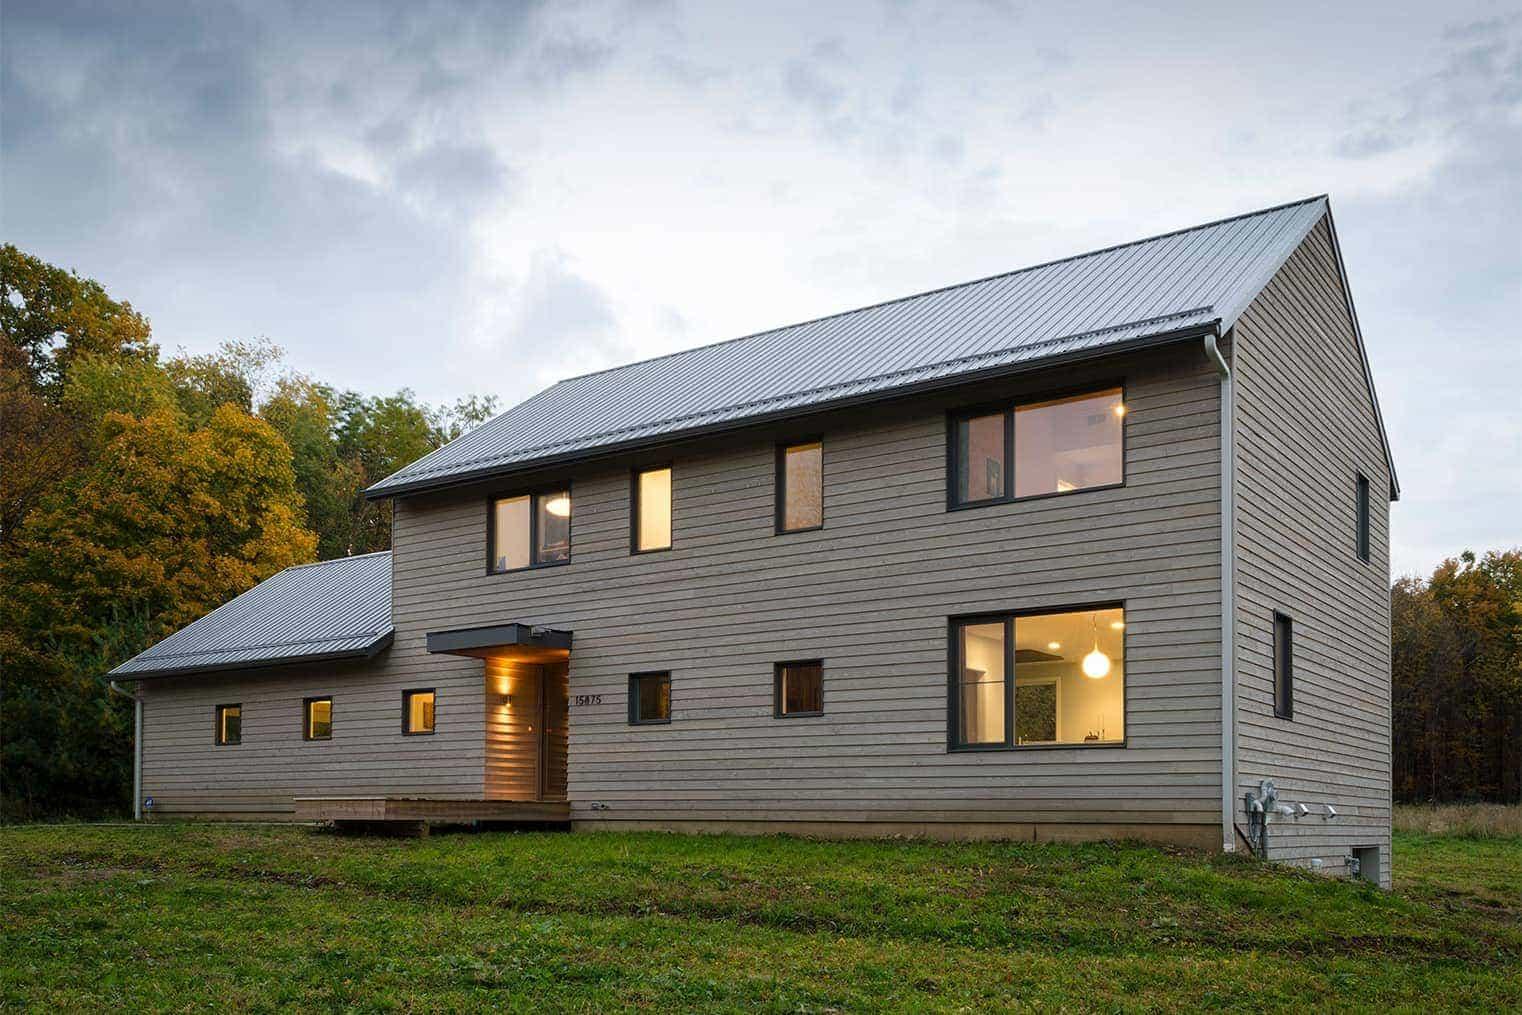 The Modern Farmhouse